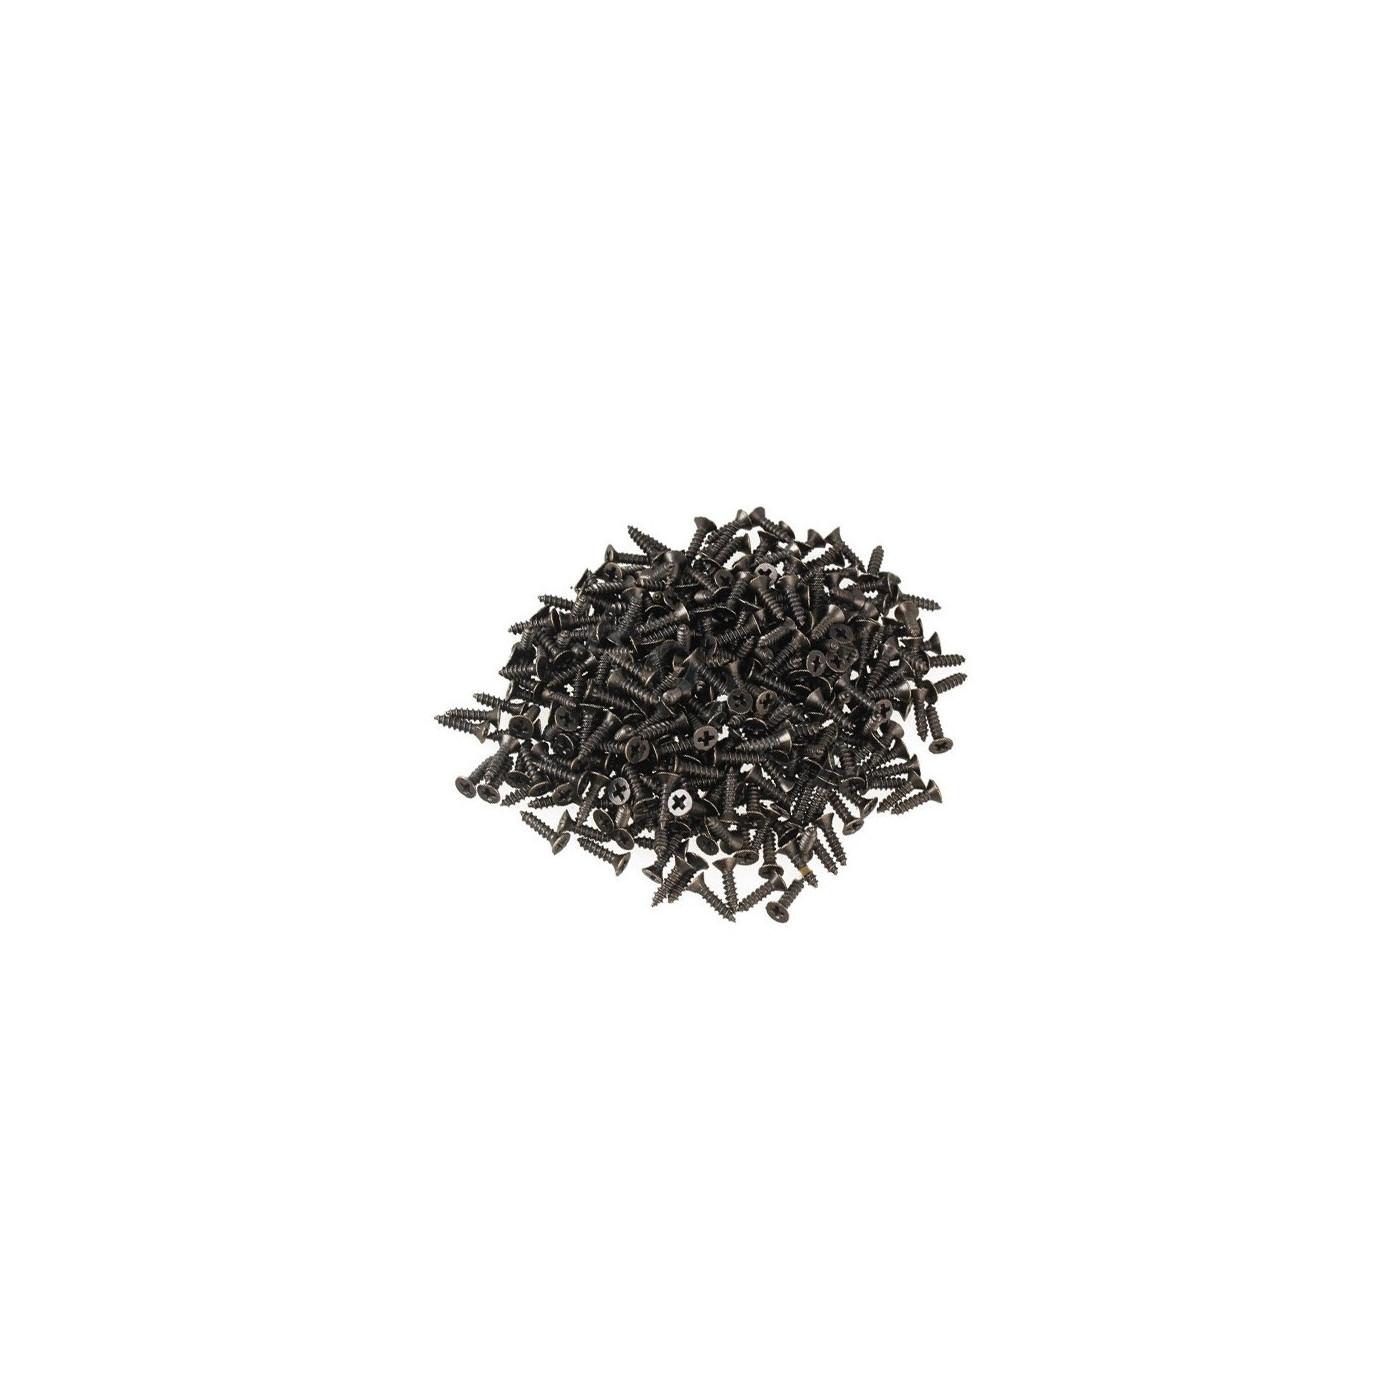 Set of 300 mini screws (2.0x8 mm, countersunk, bronze color)